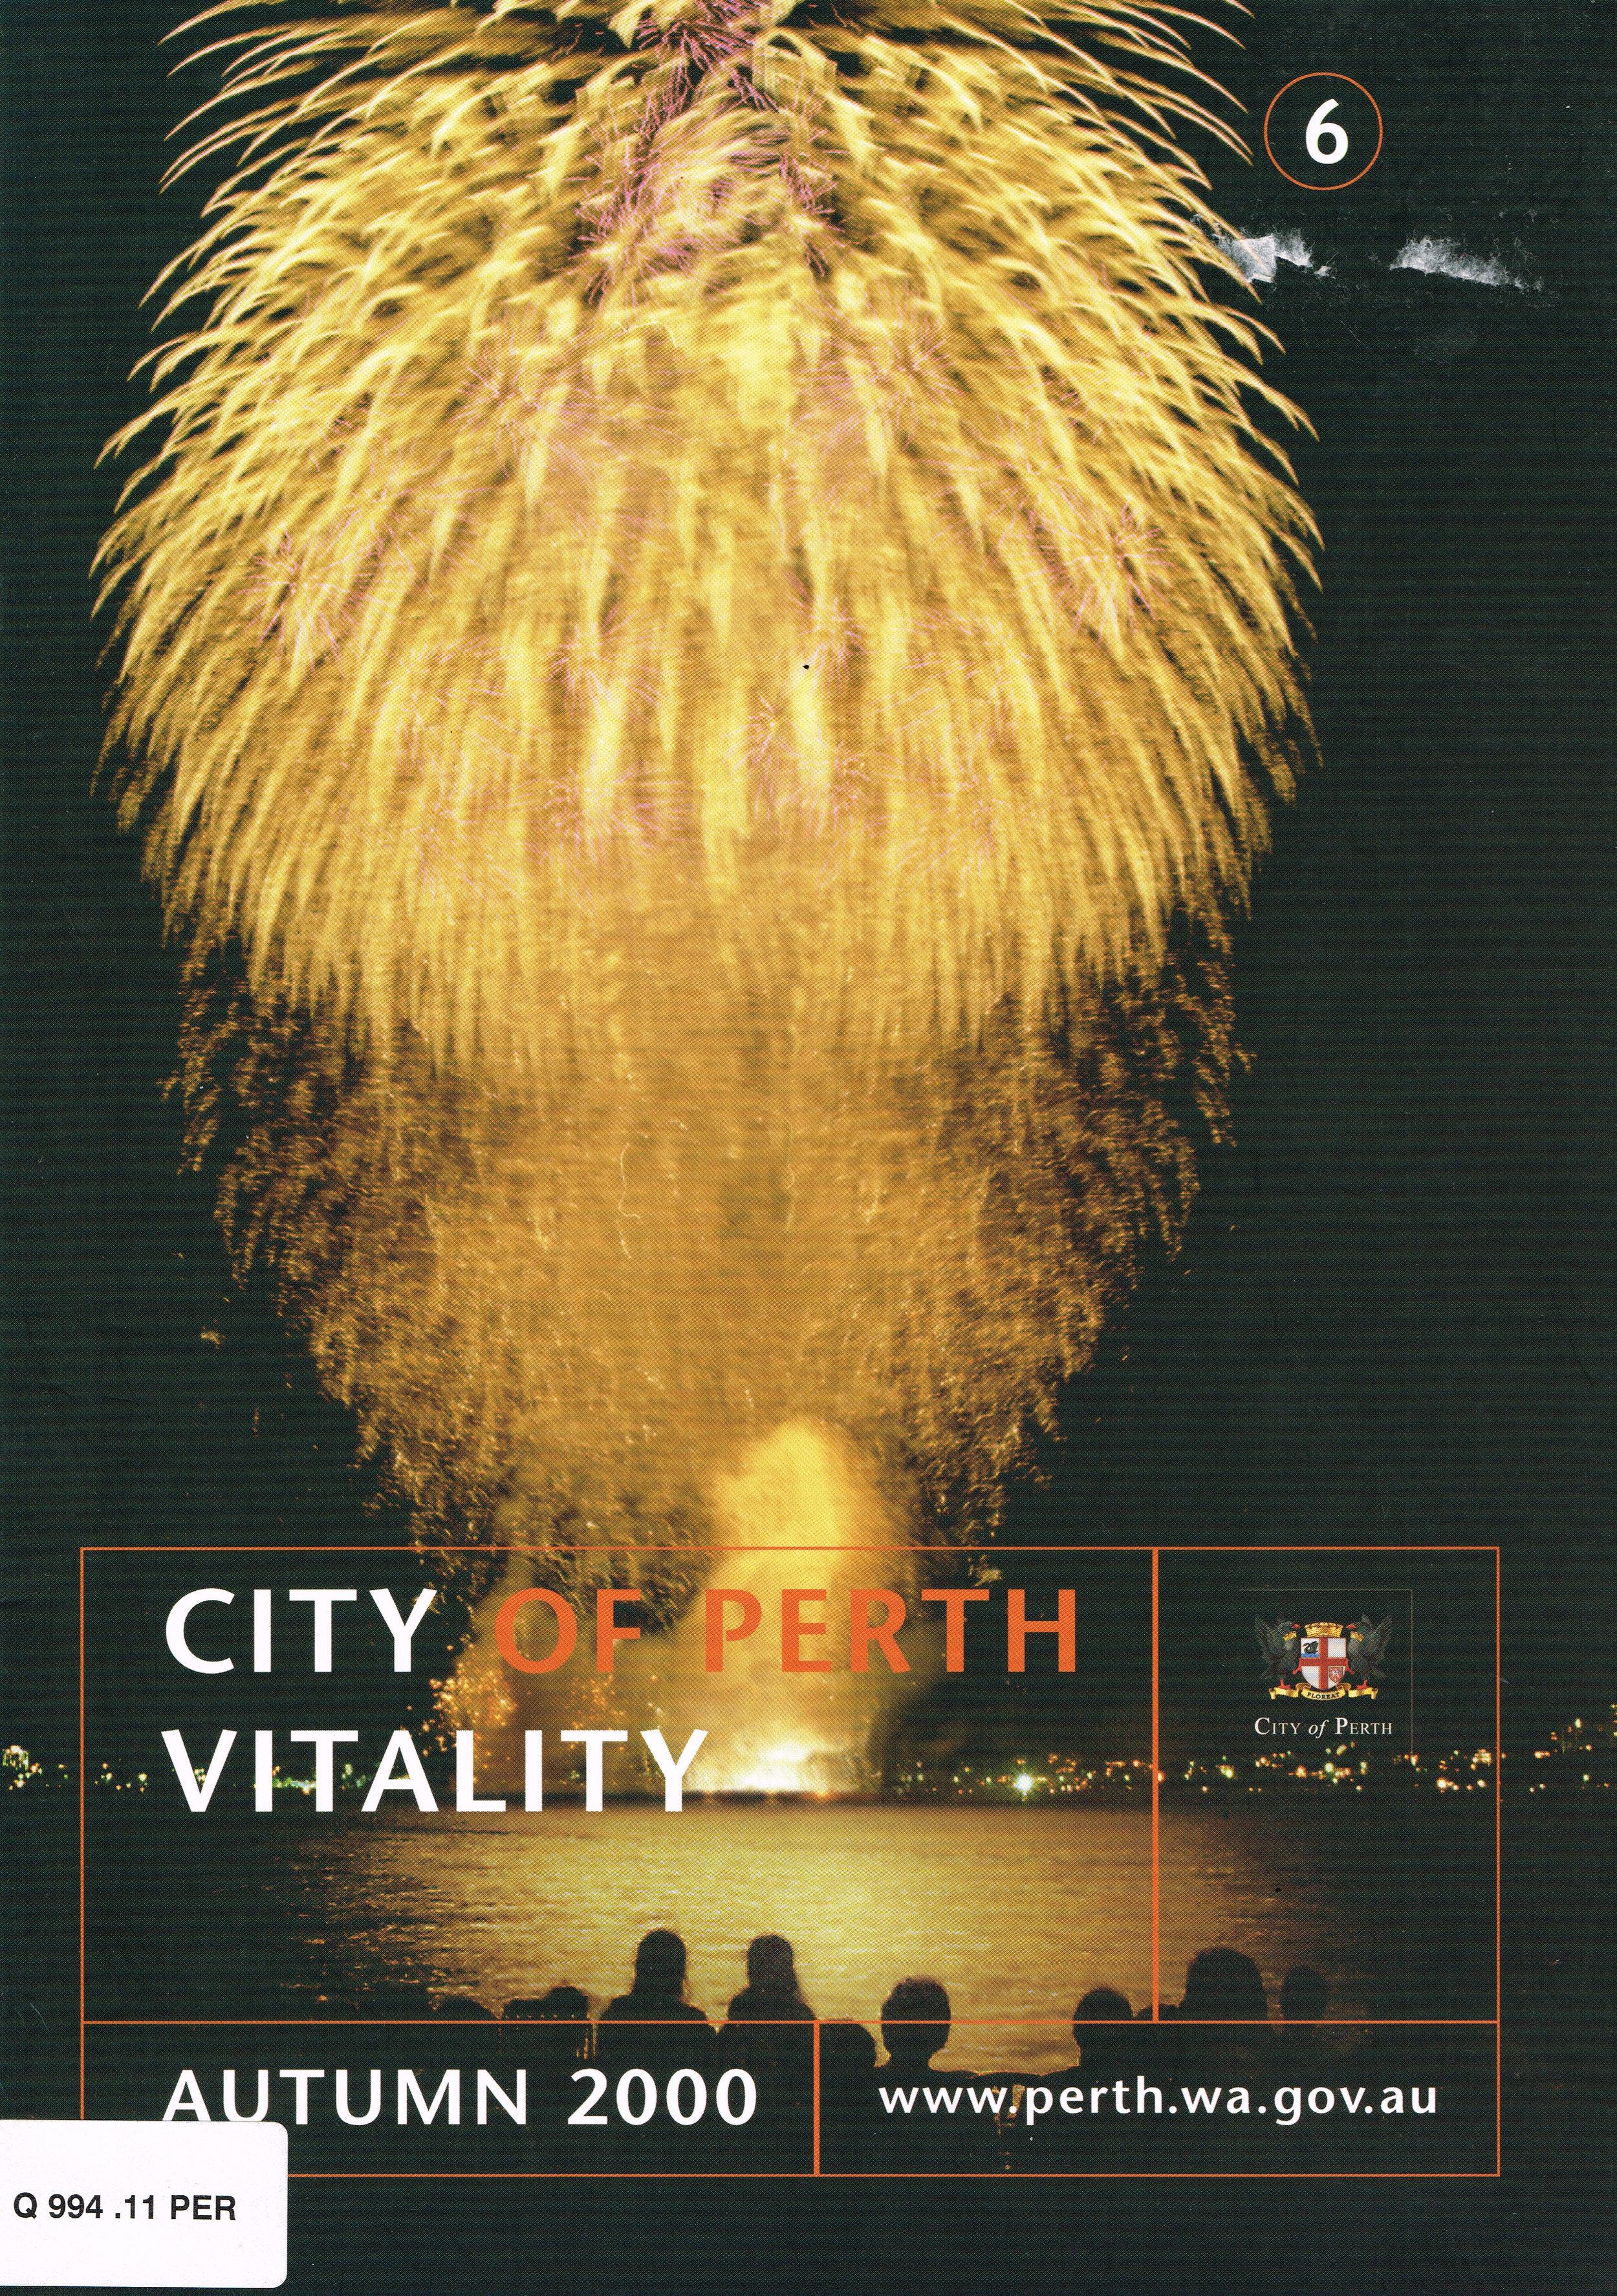 City of Perth Vitality : Autumn 2000  City of Perth, April 2000